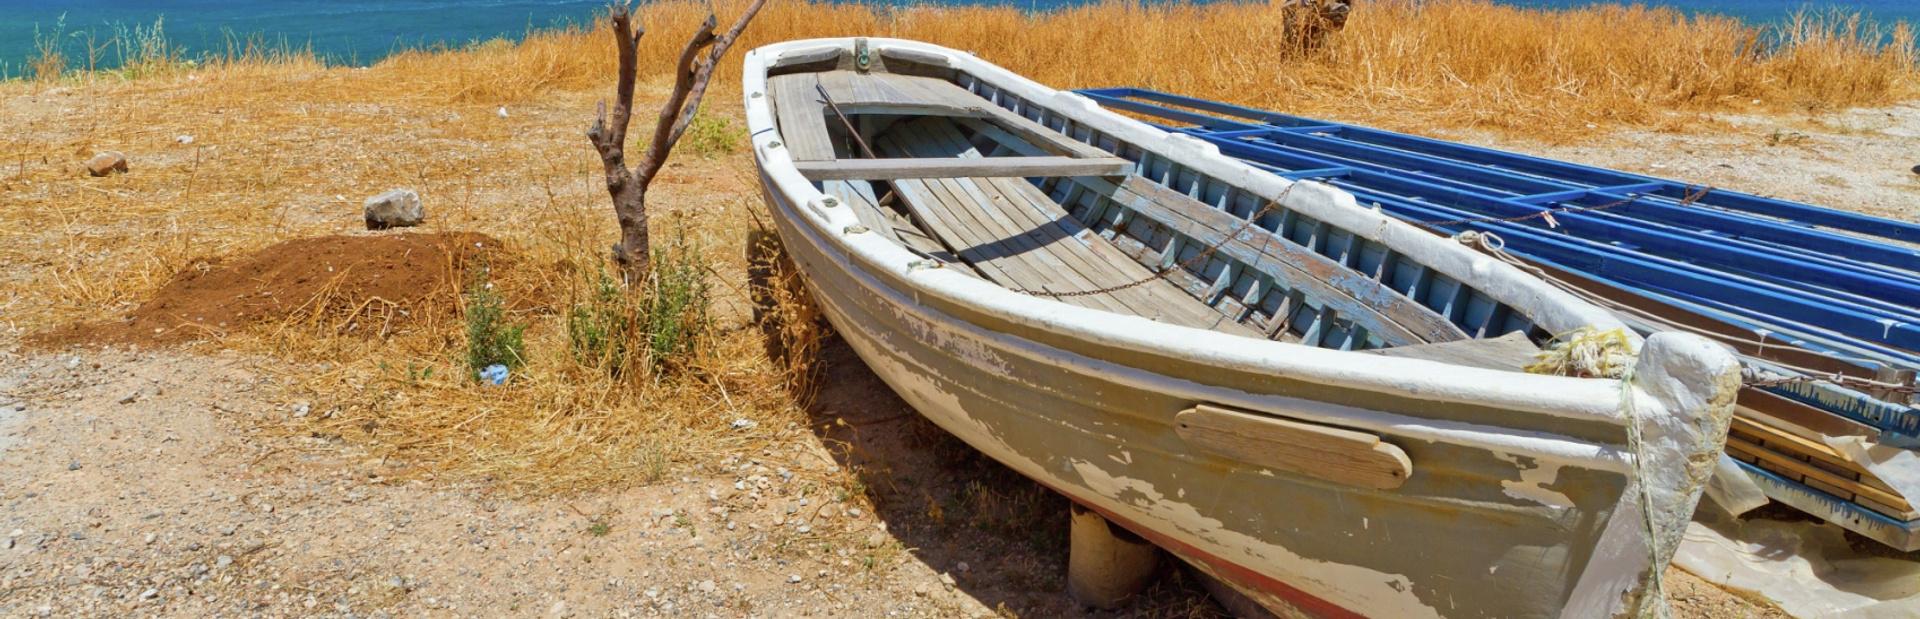 Crete news photo